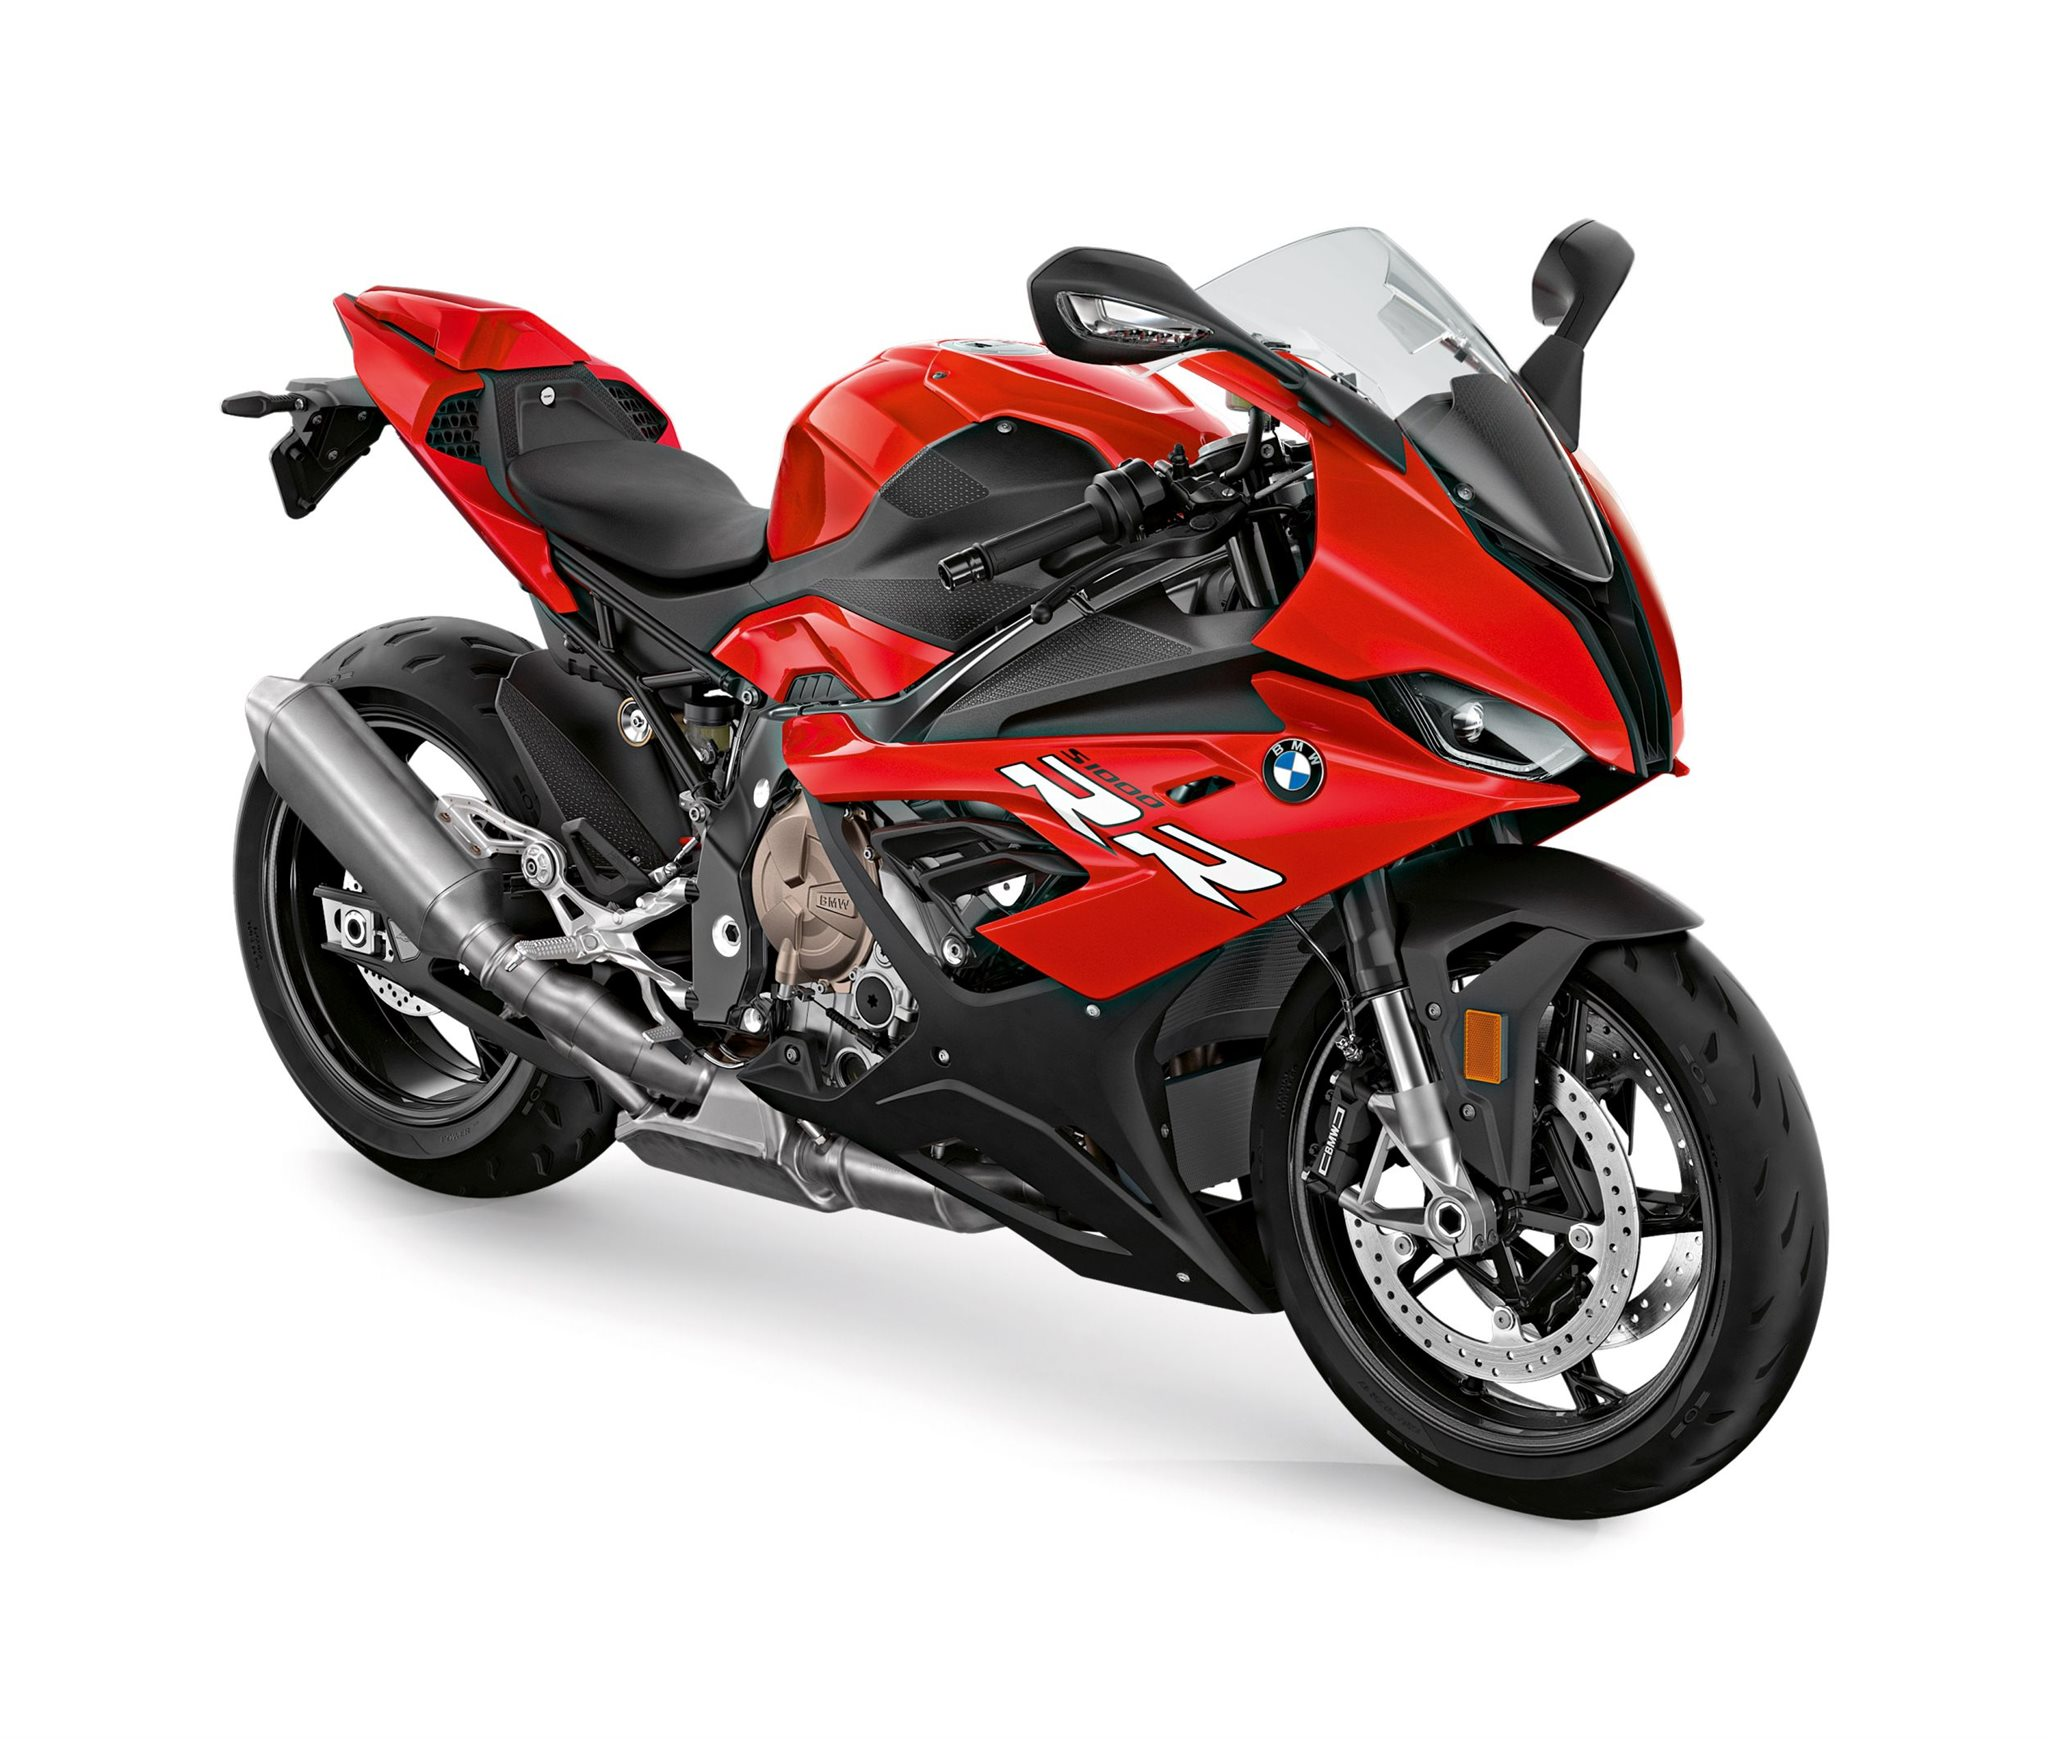 S 1000 Rr Bmw Motorrad